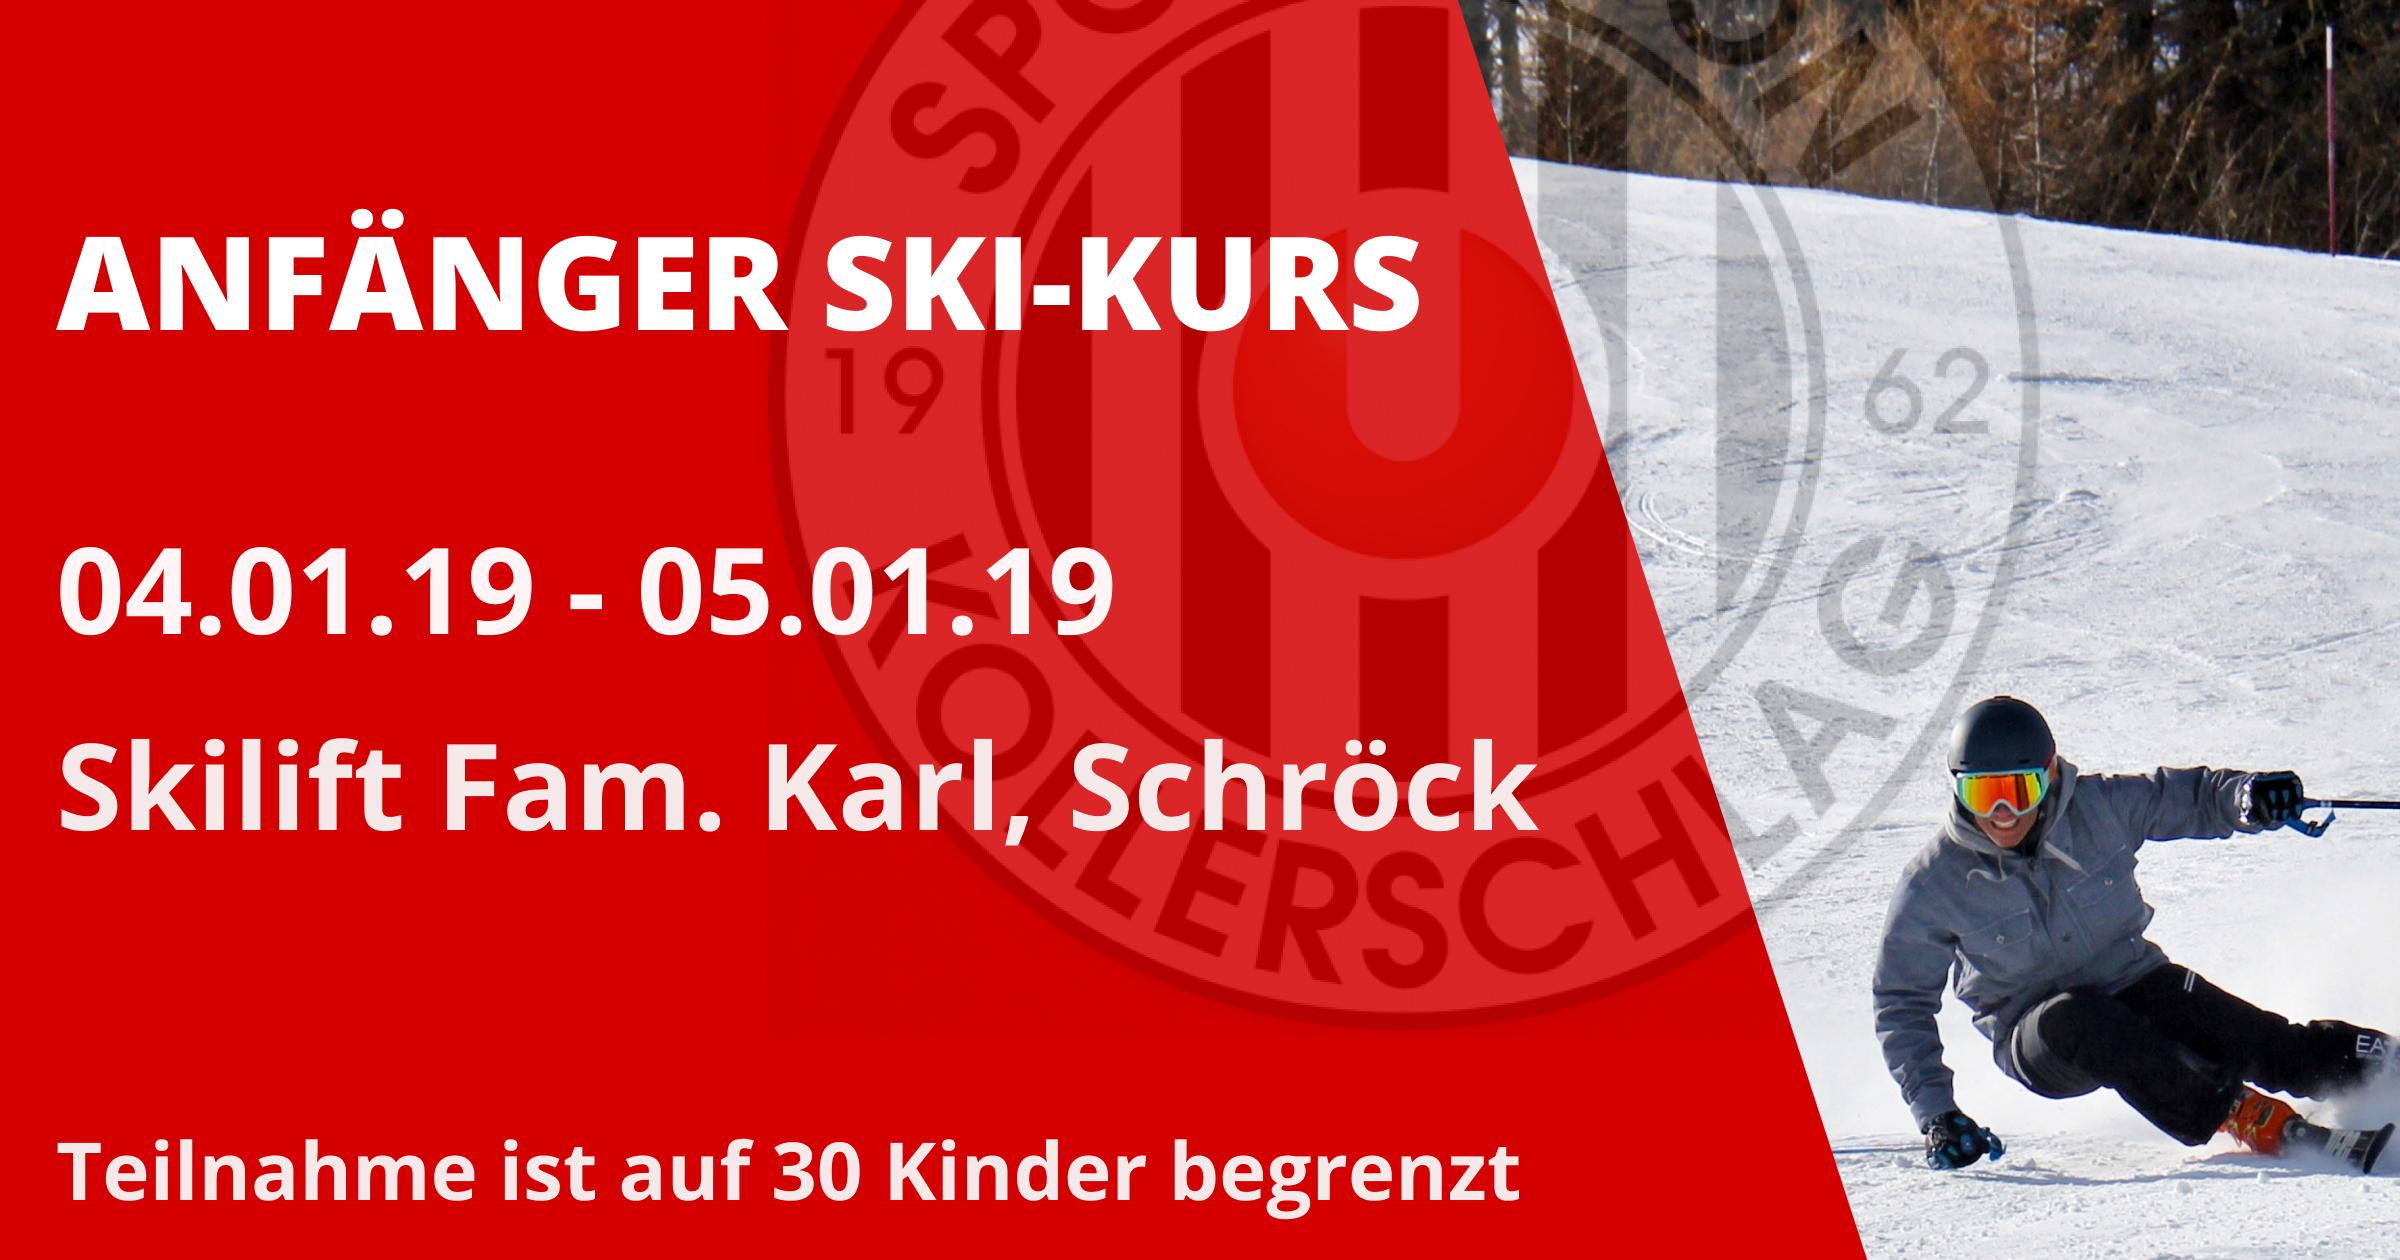 Anfänger Ski-Kurs am 04. und 05. Jänner 2019